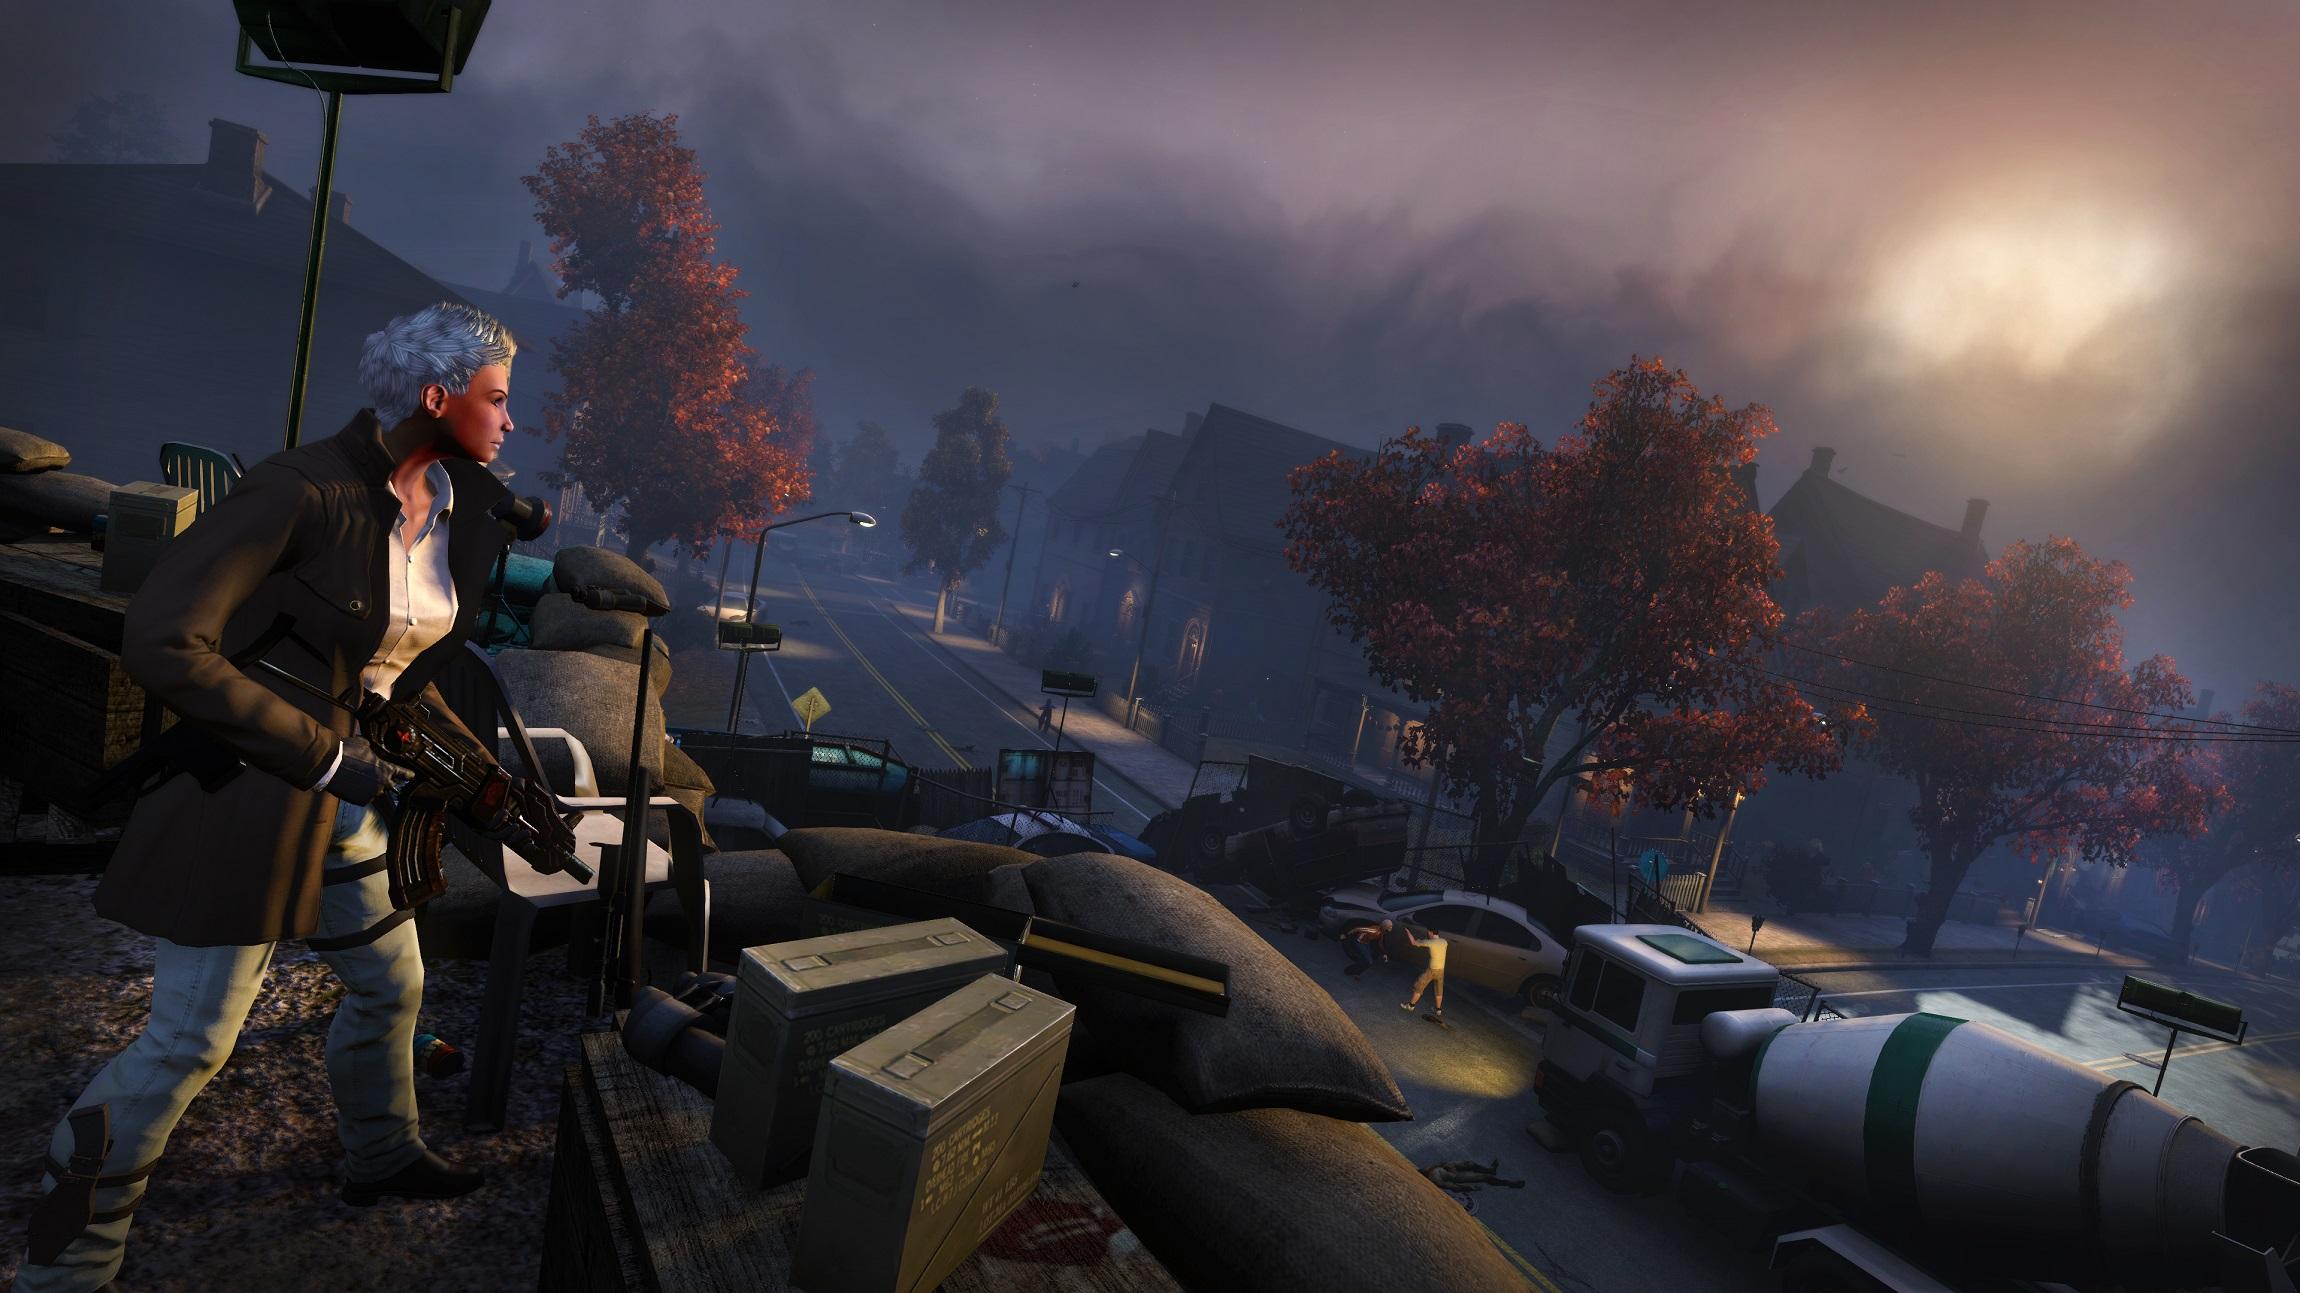 New Secret World Legends Trailer Focuses on Combat | AllGamers